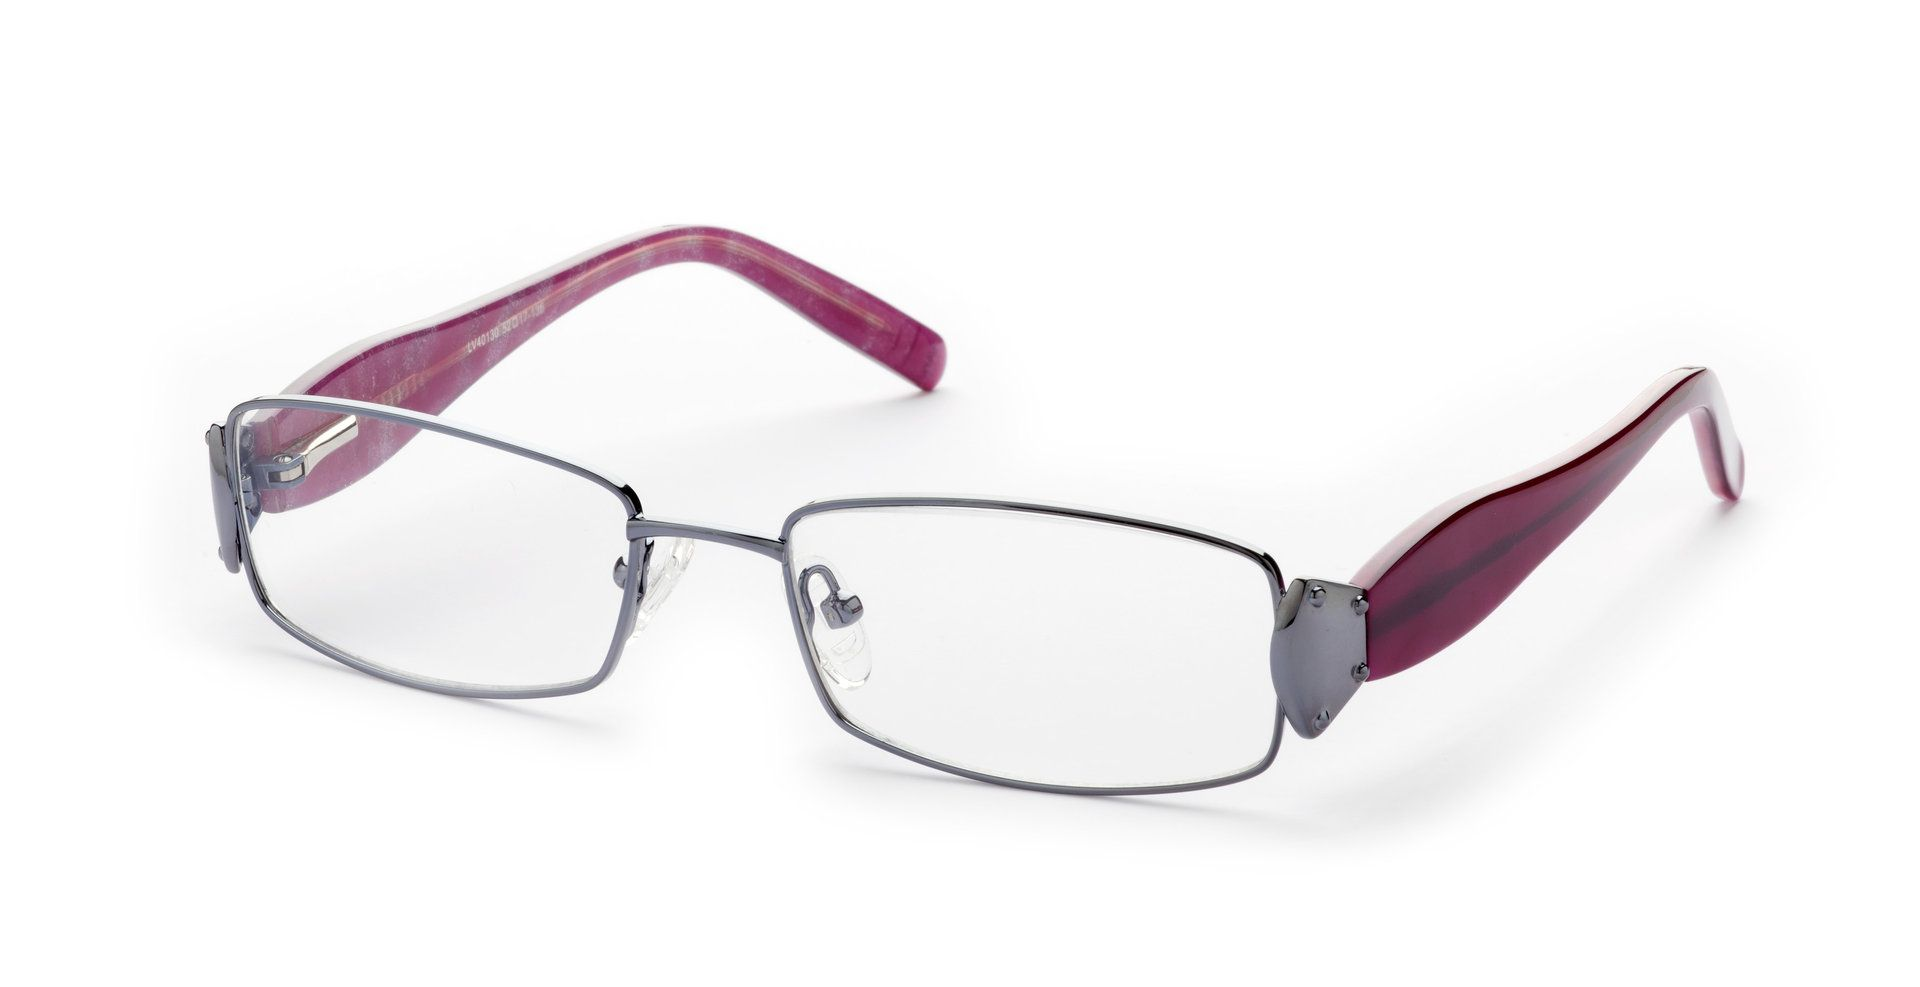 Lennox Eyewear Sarita Silber/Lila - Damenbrillen | Brillen-Klassiker